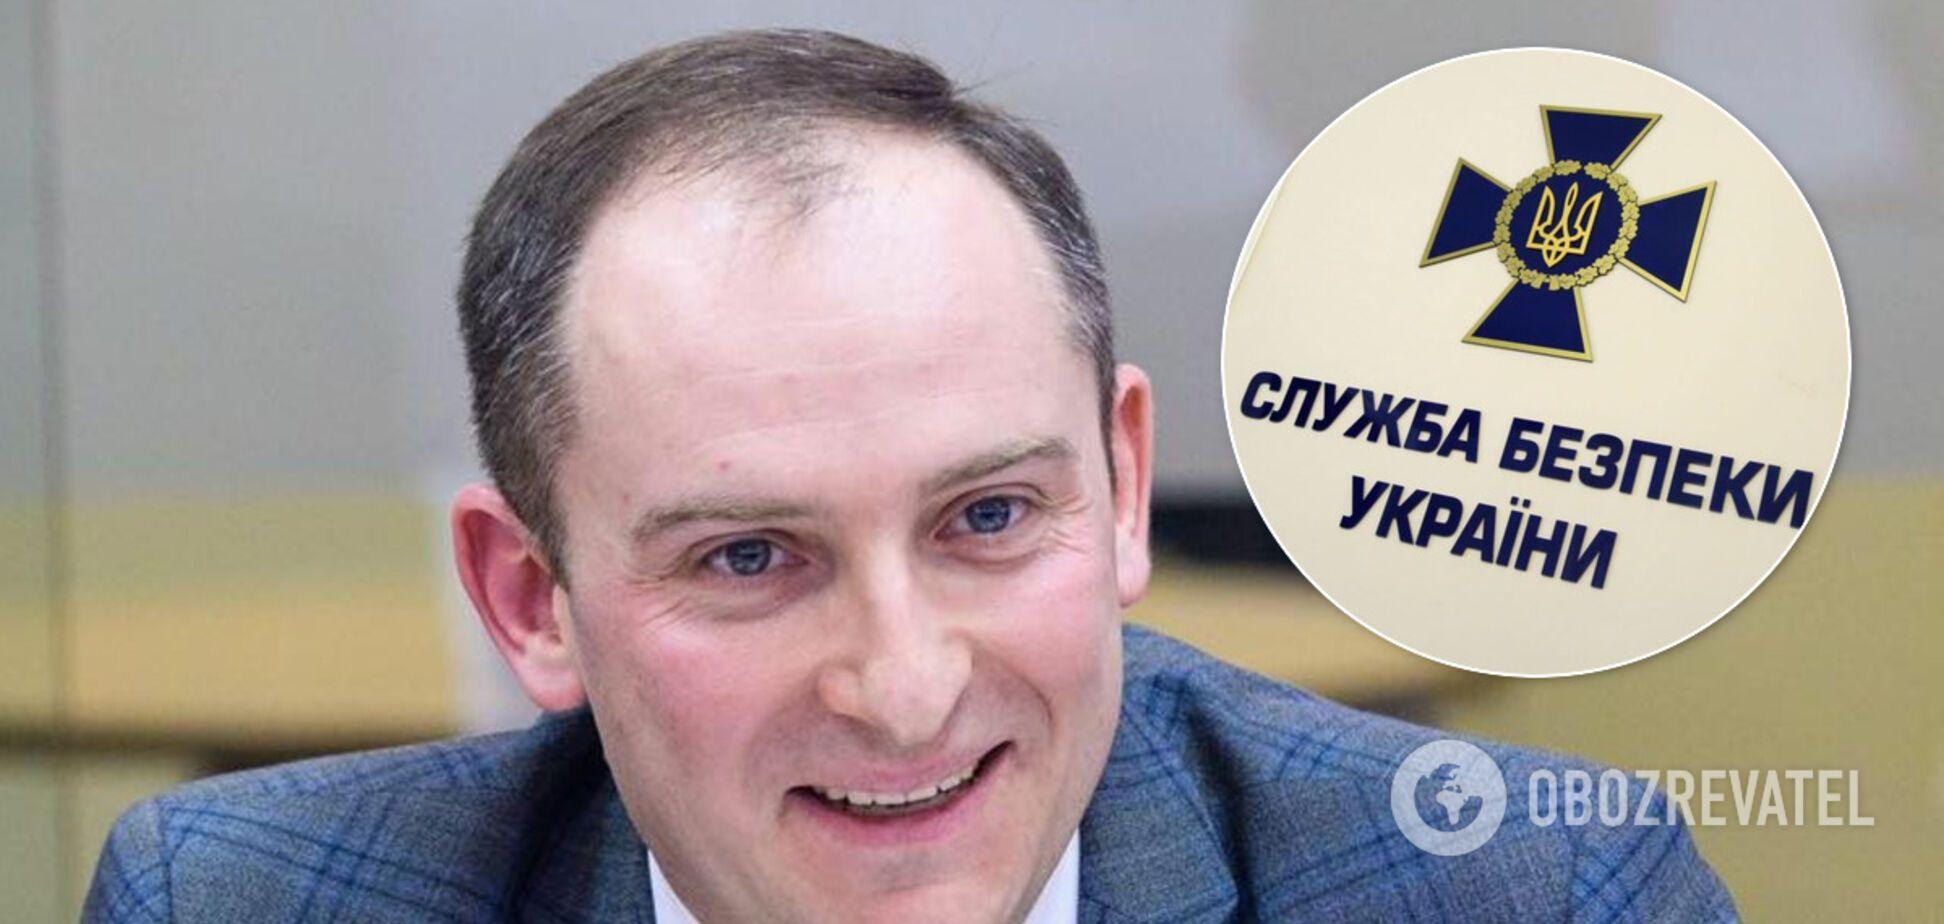 Обшуки у Верланова: в СБУ озвучили гучну причину